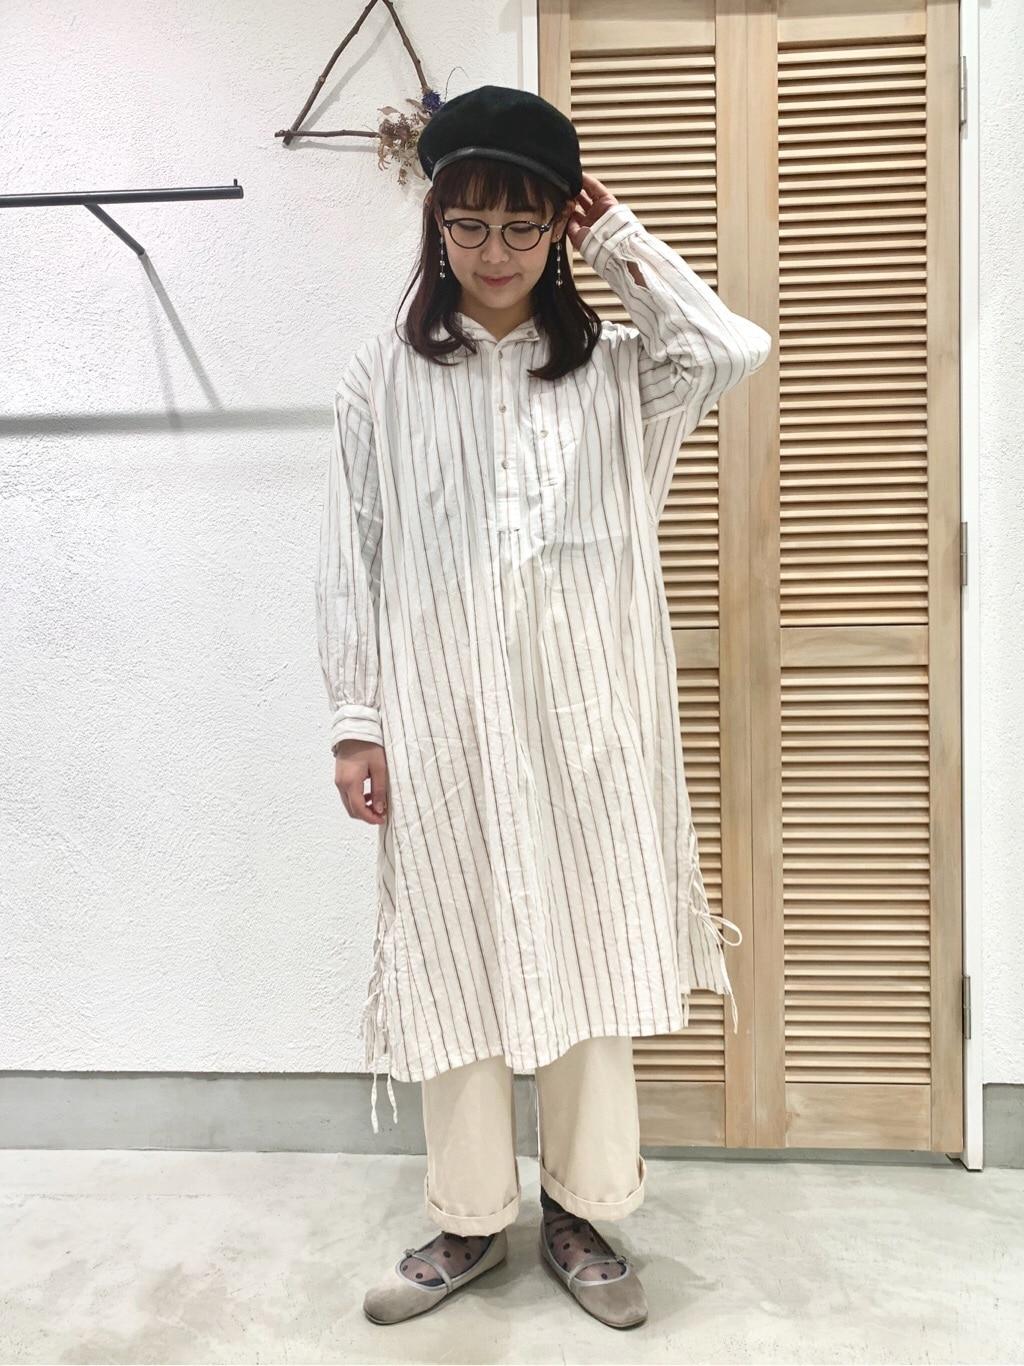 chambre de charme 横浜ジョイナス 身長:162cm 2021.02.13